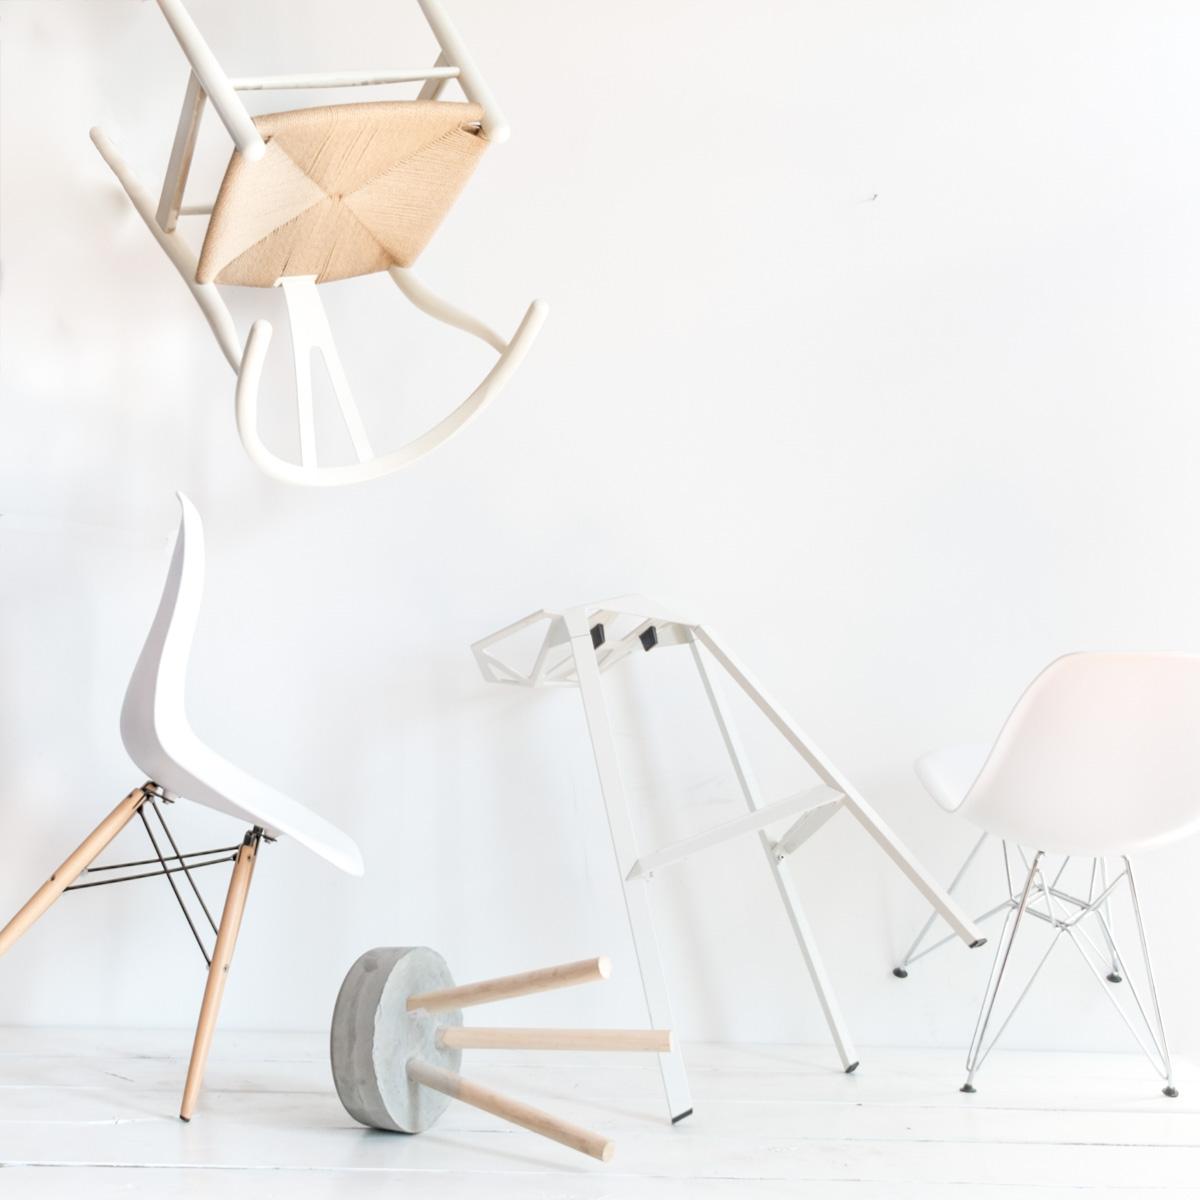 katrina_hoernig_interior_prop_designer_Stylist_chicago4.jpg